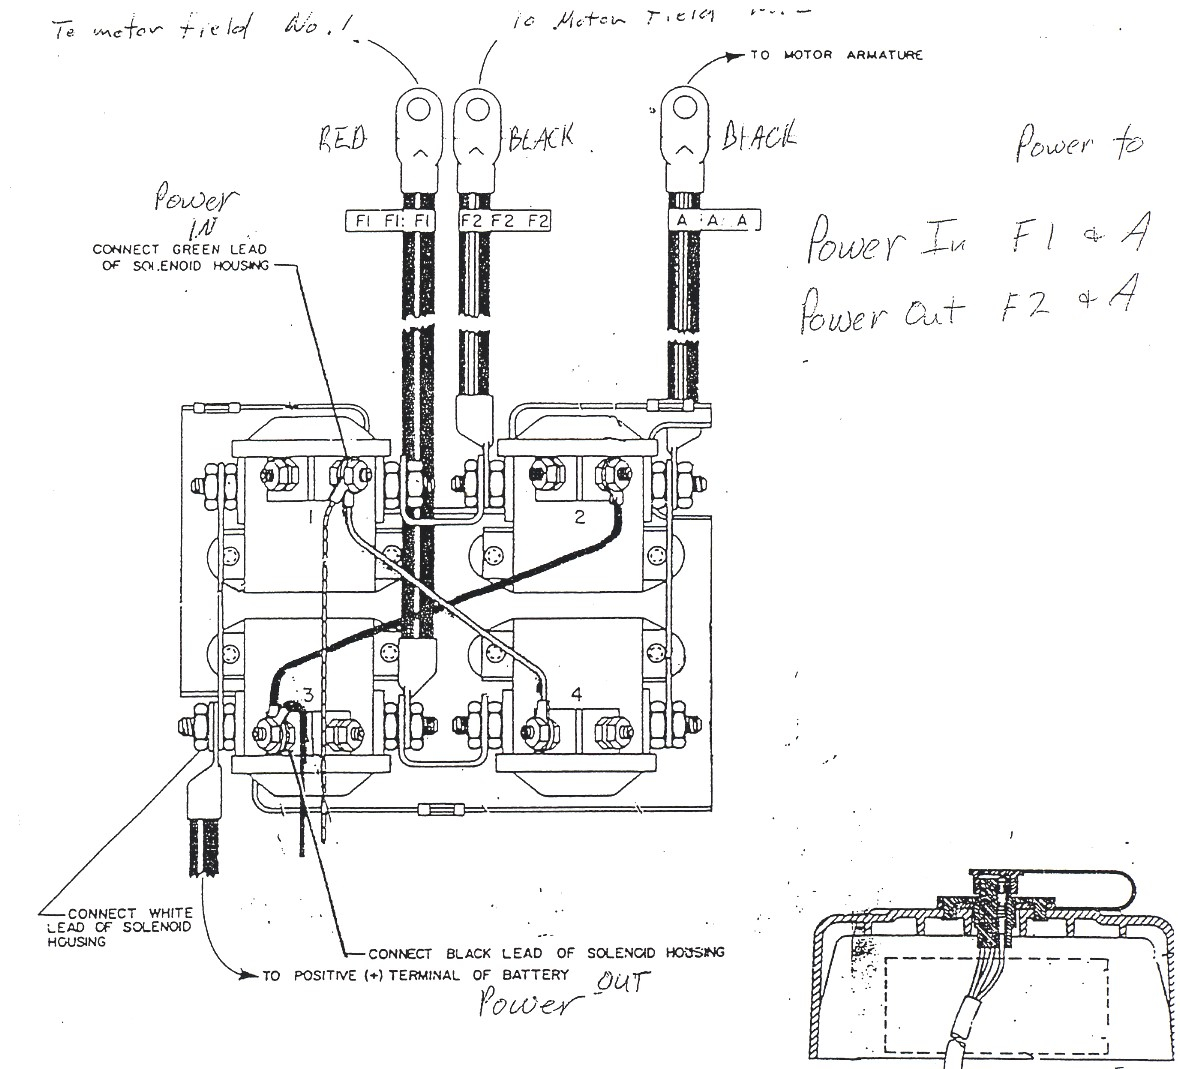 For Atv Winch Wiring Relay | Wiring Diagram - Warn Winch Wiring Diagram